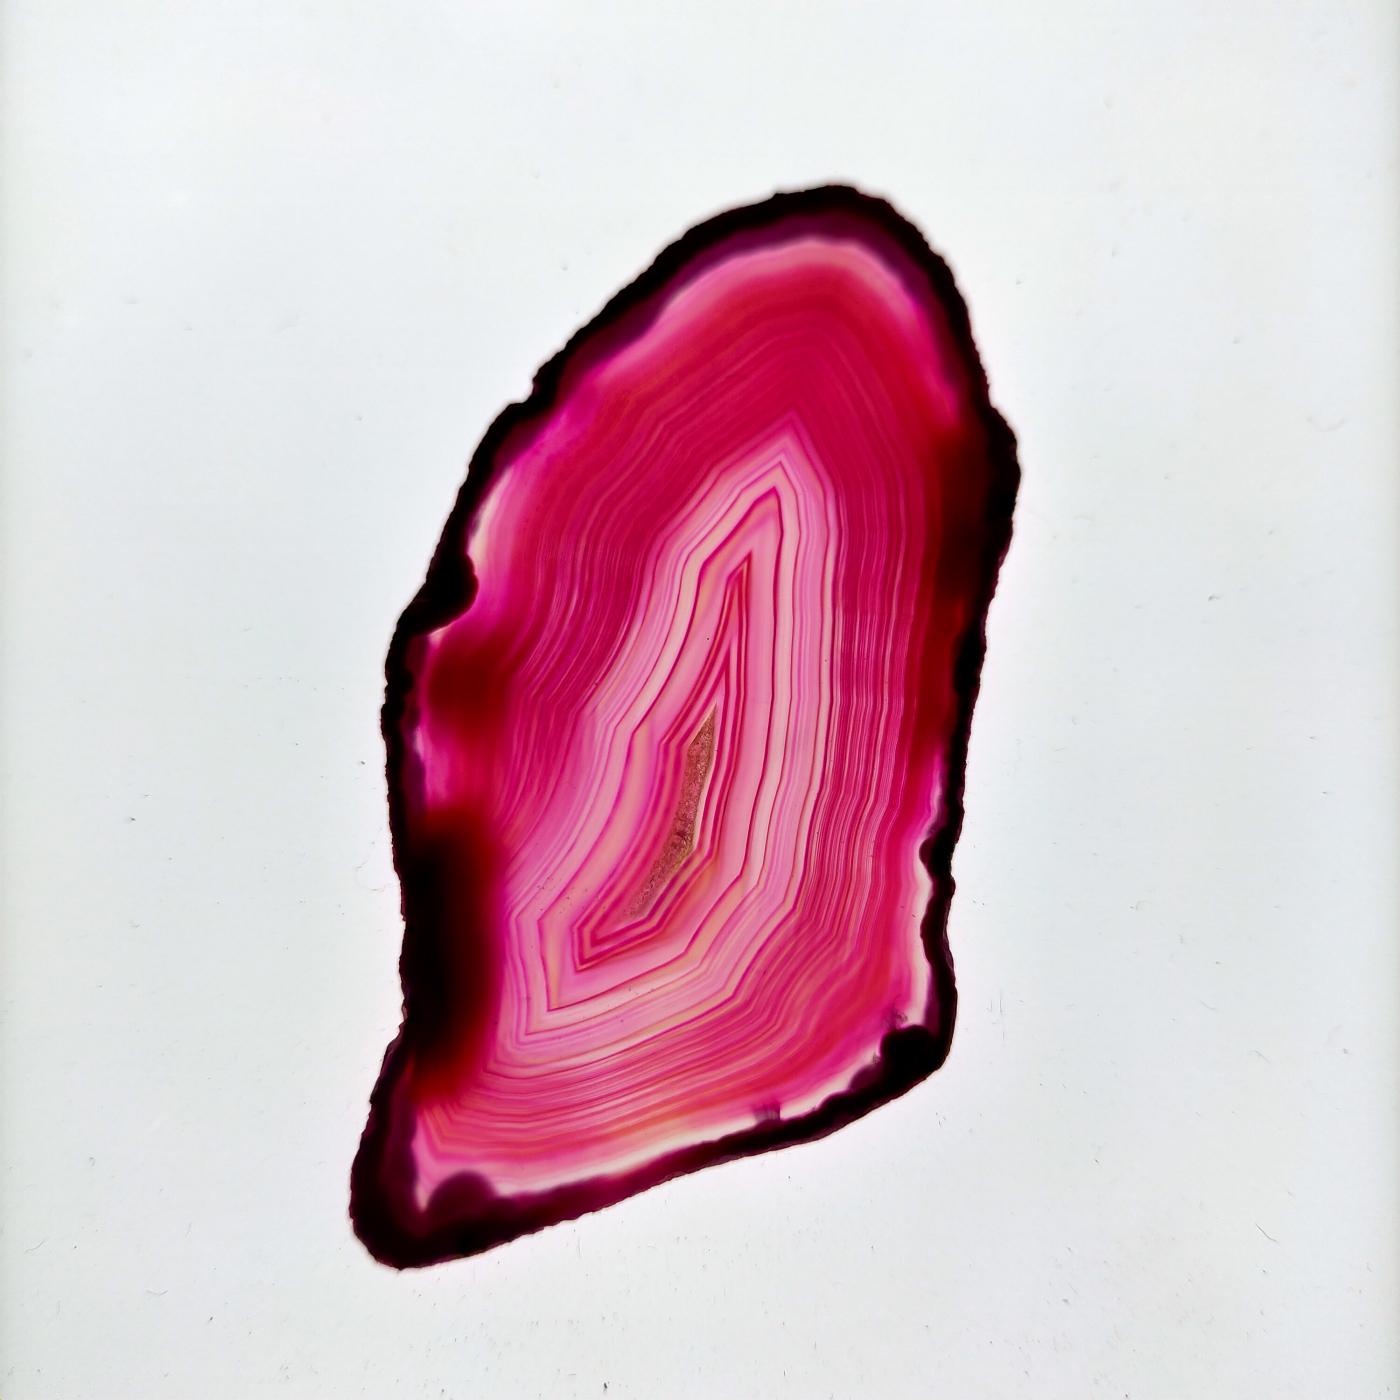 Ágata laminada rosa intenso -